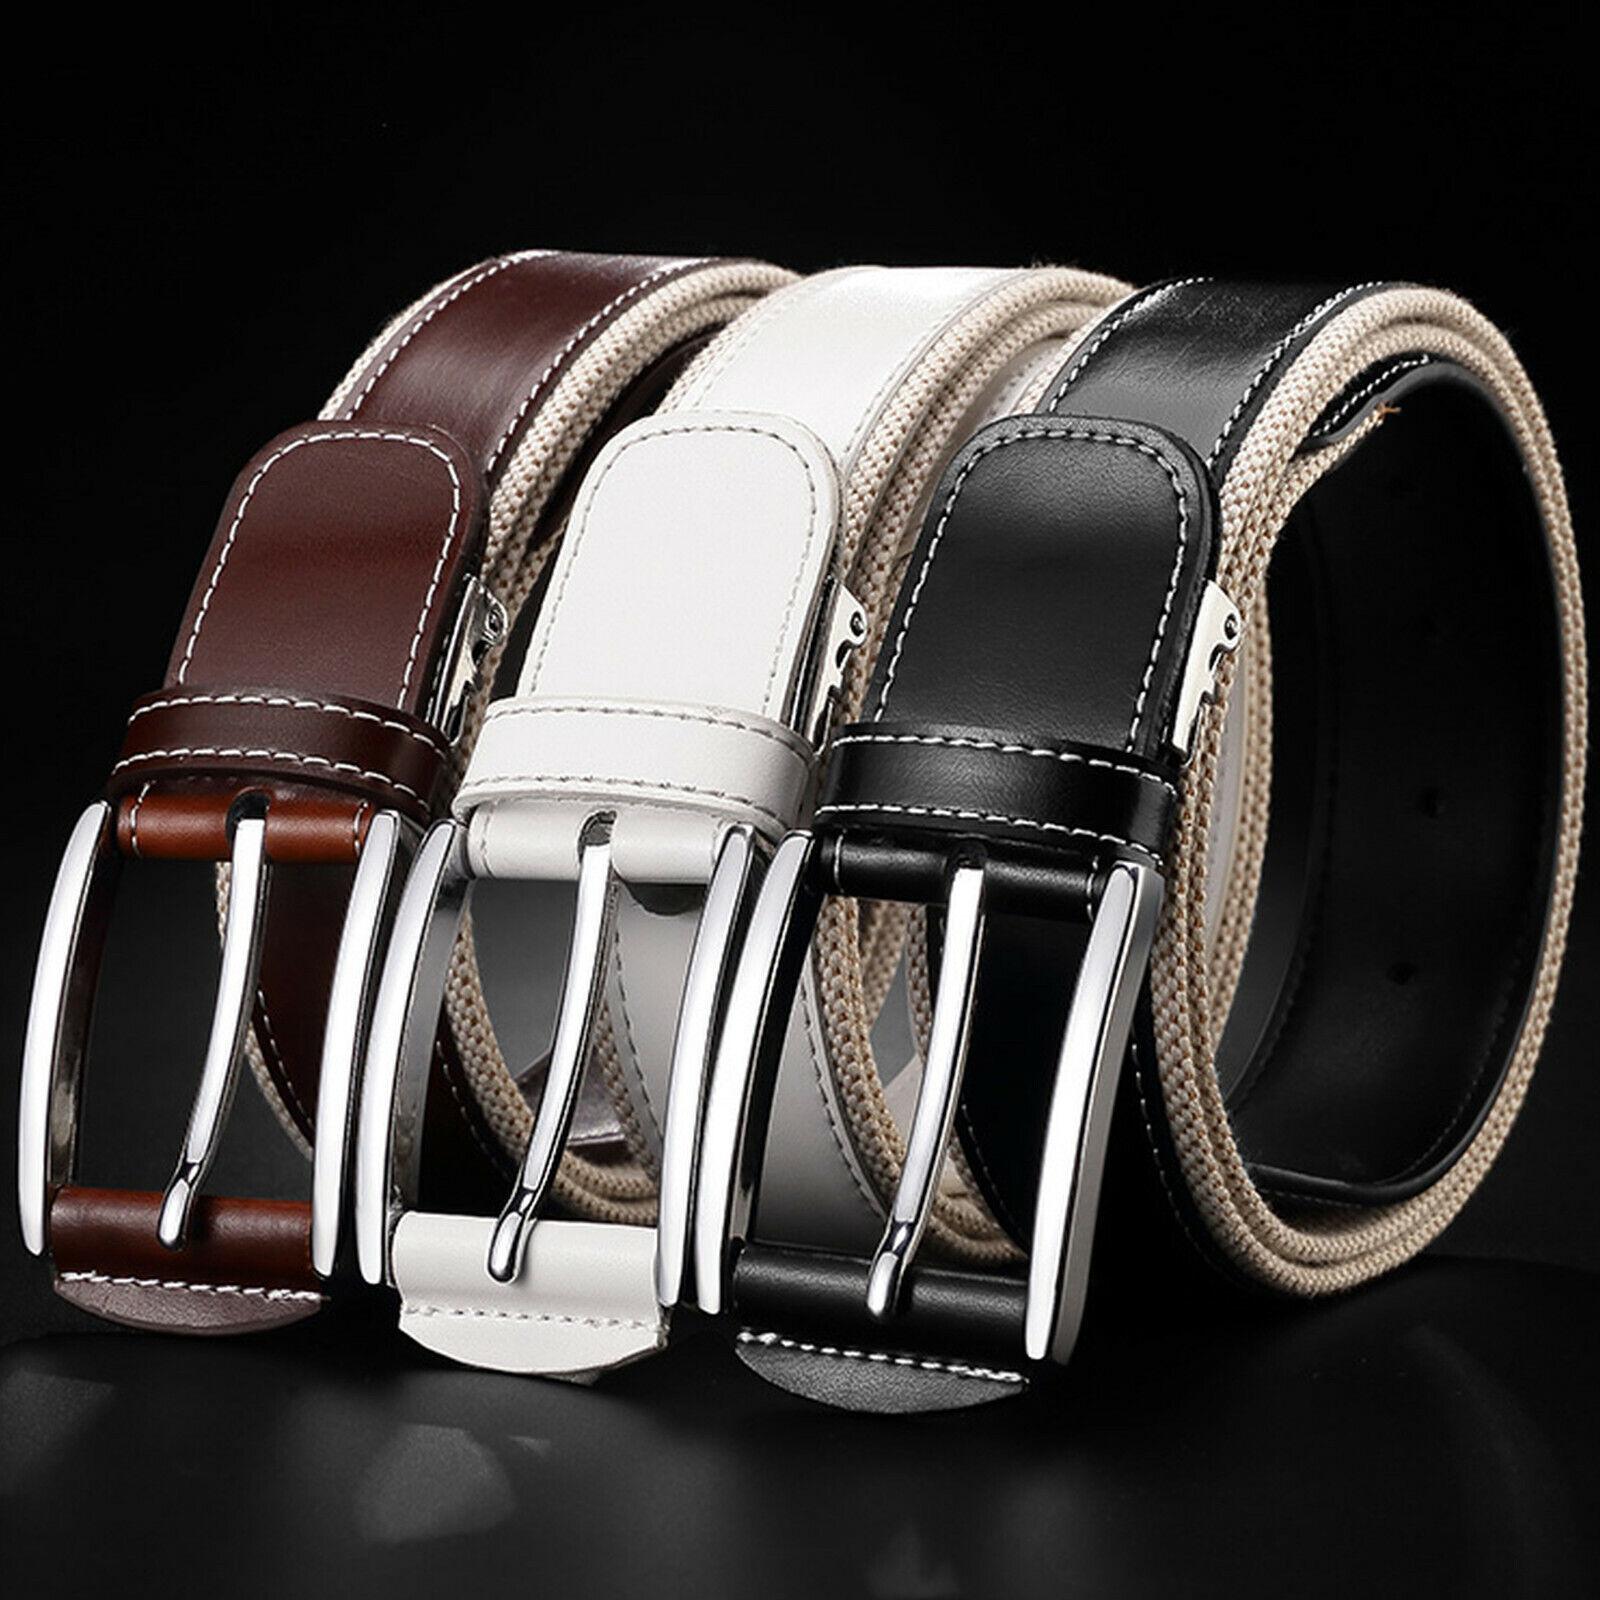 Men's Metal Buckle Top Grain Leather and Canvas Business Casual Dress Belt Belts